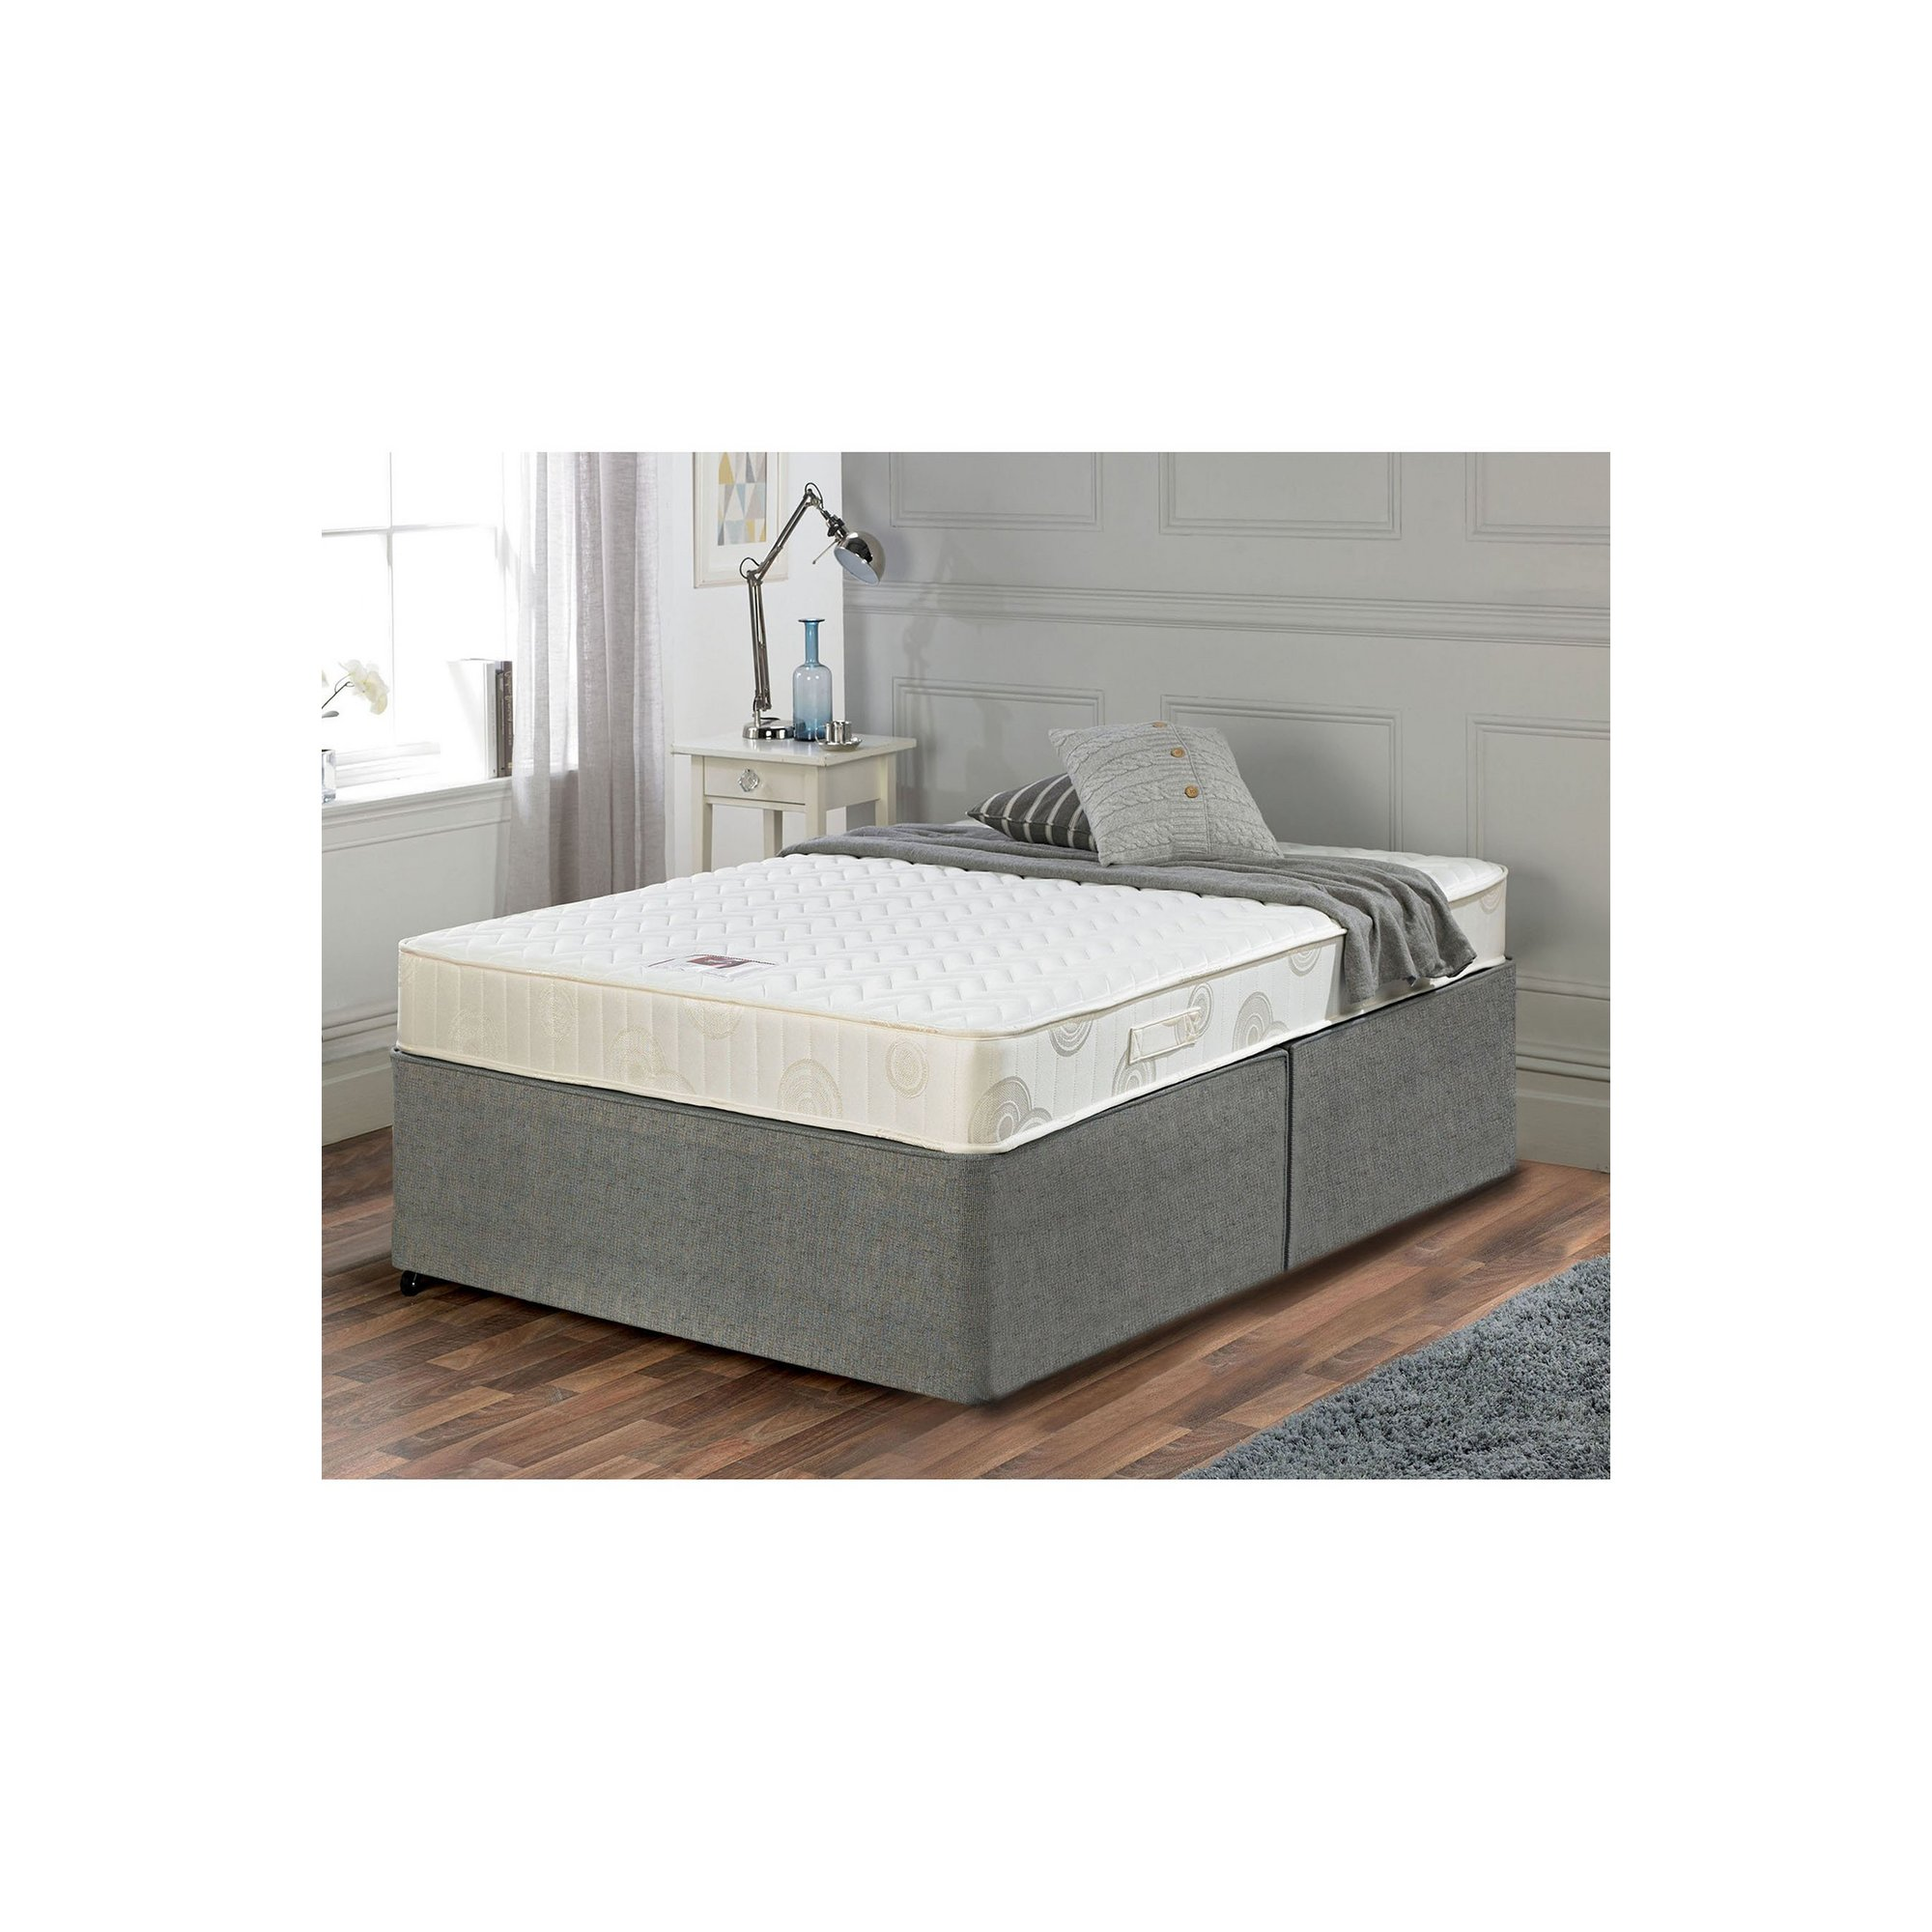 Image of Airsprung Memory Flex Divan Bed Set - No Drawers